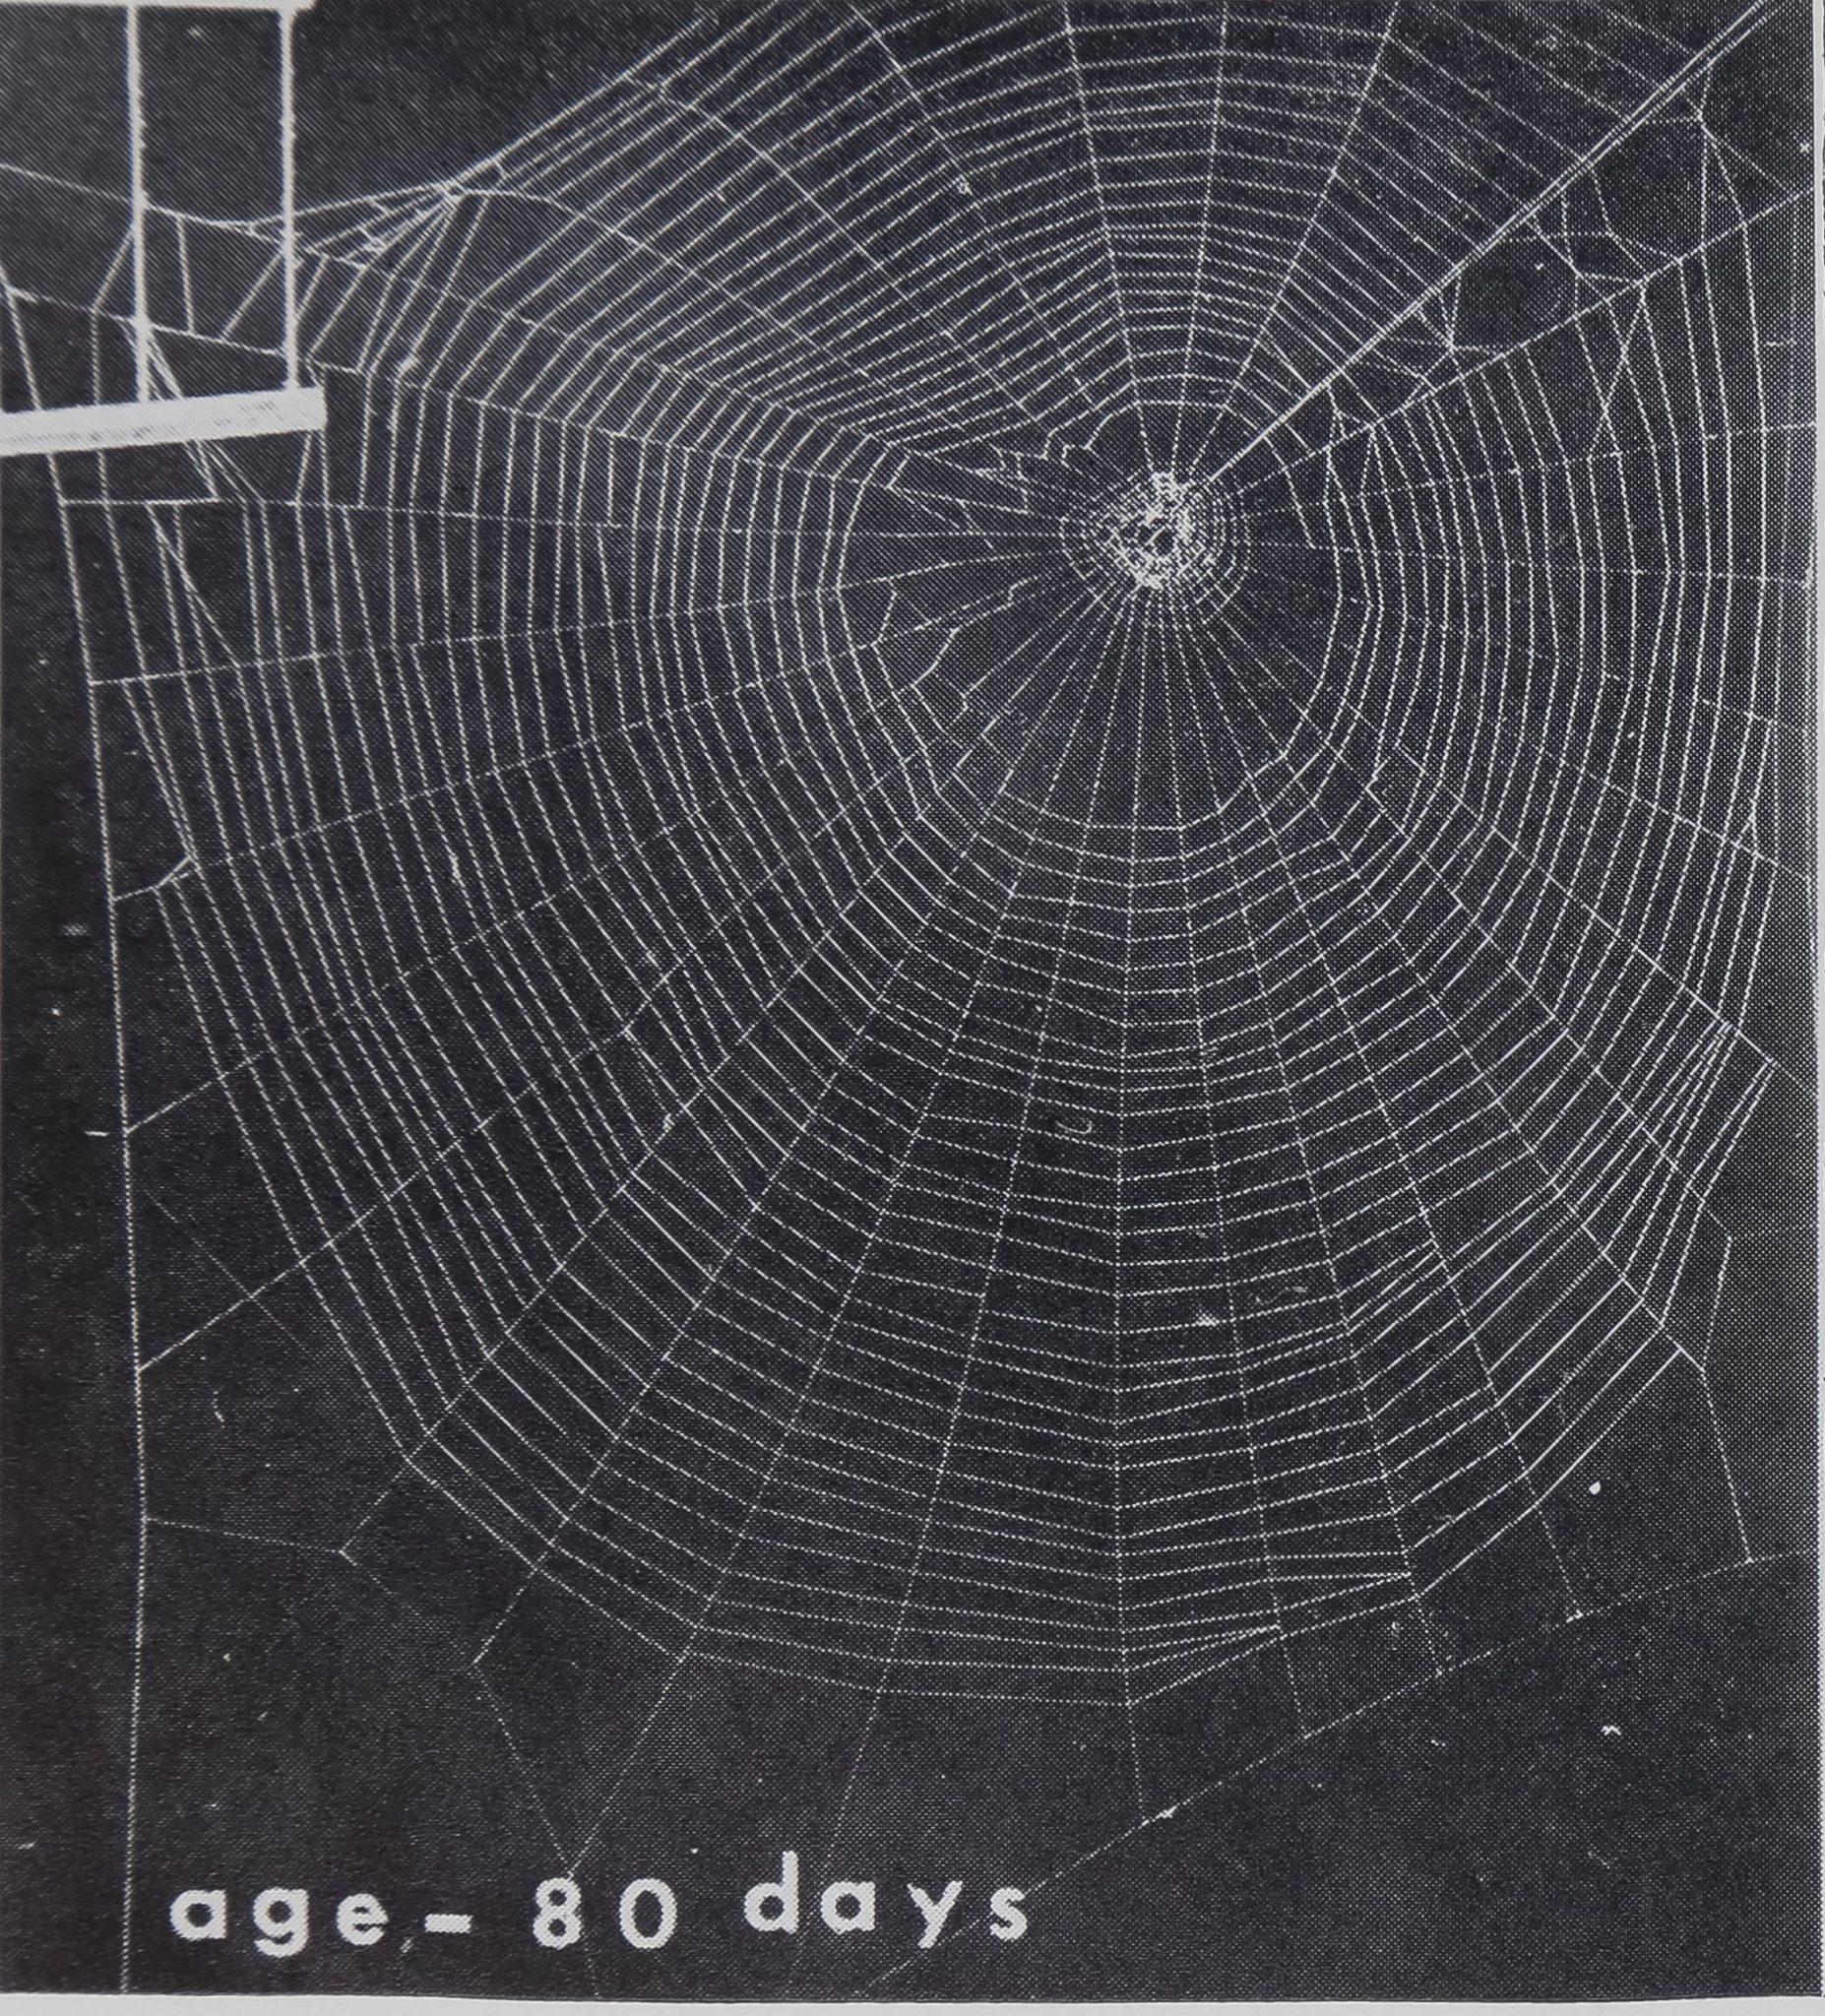 1973-BodyWebBuildingAnd-8